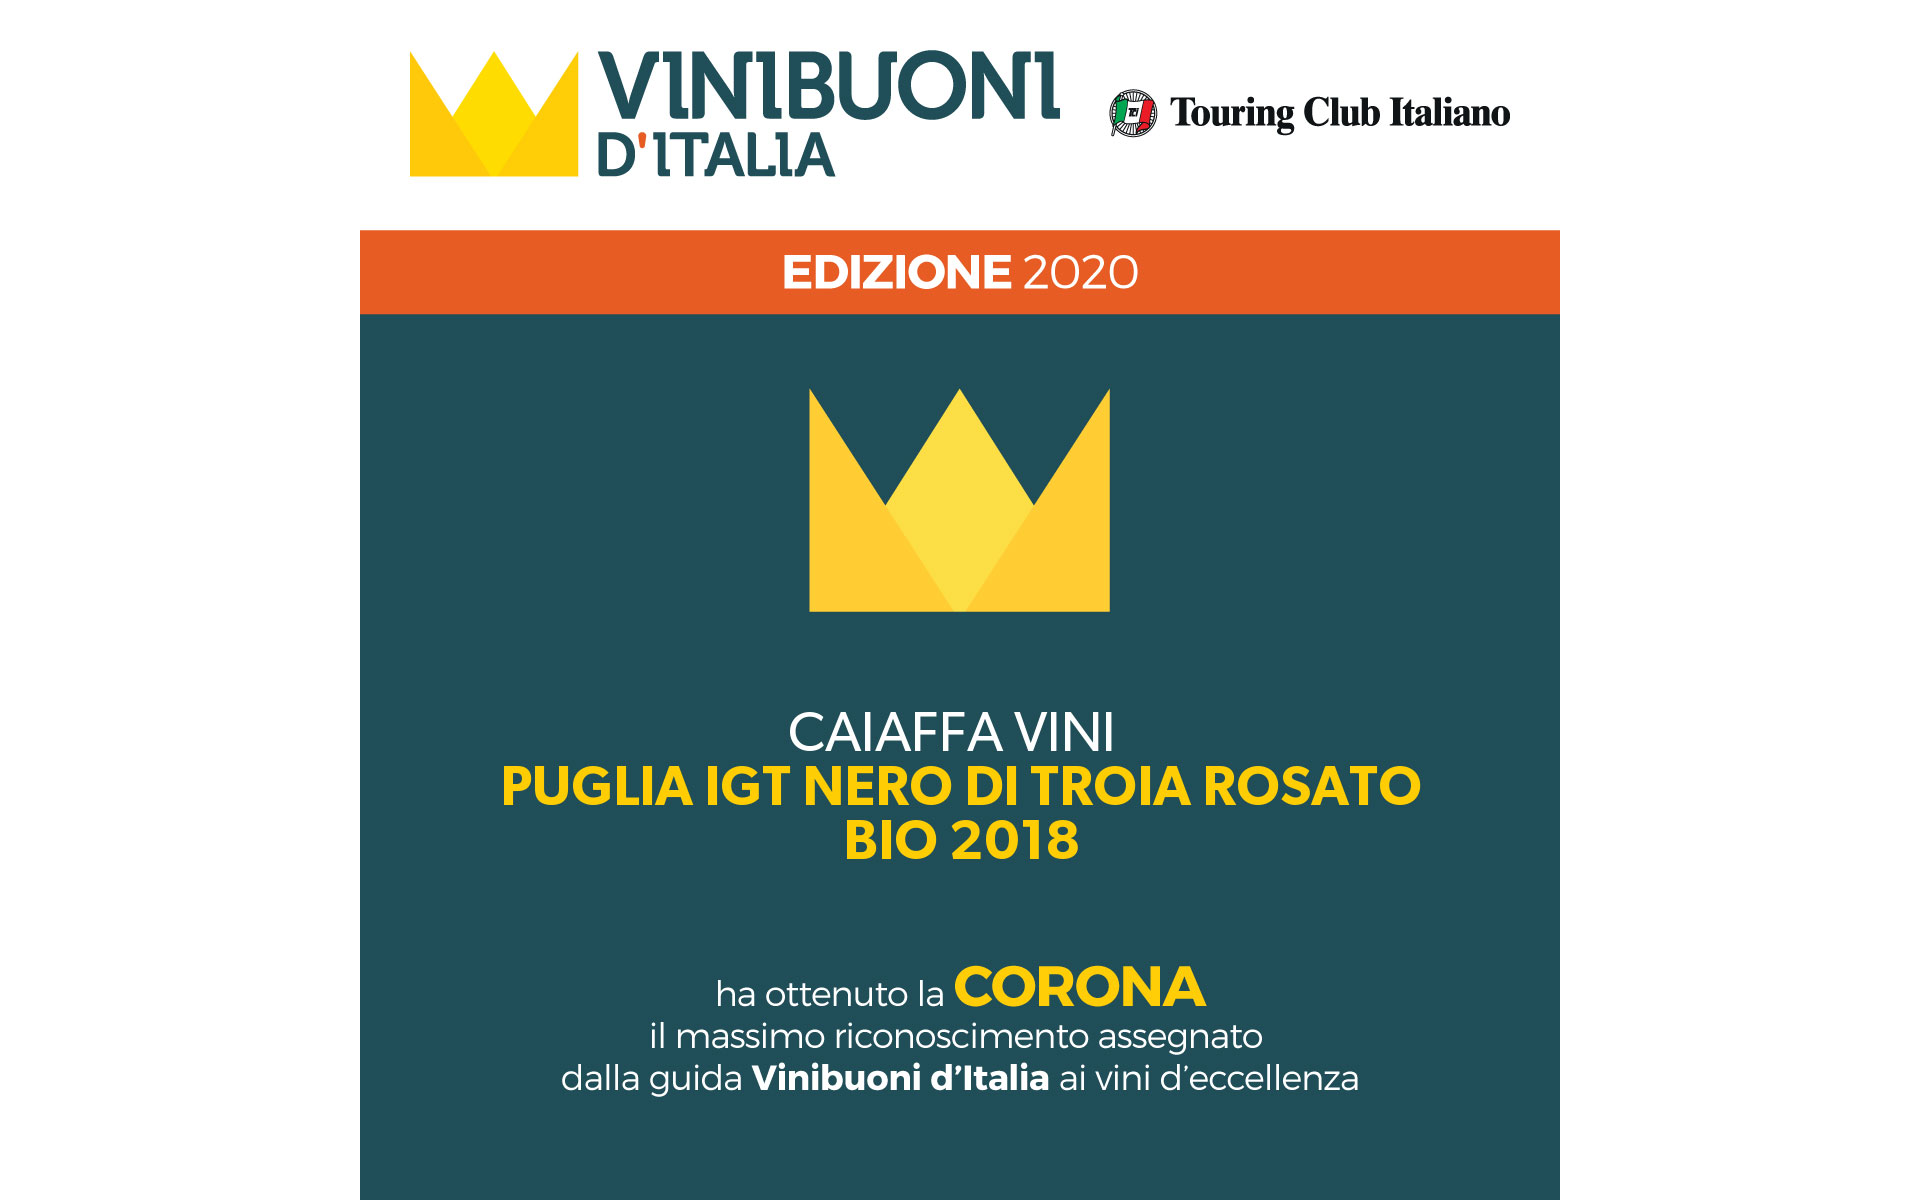 Vinibuoni d'Italia 2020 – Corona